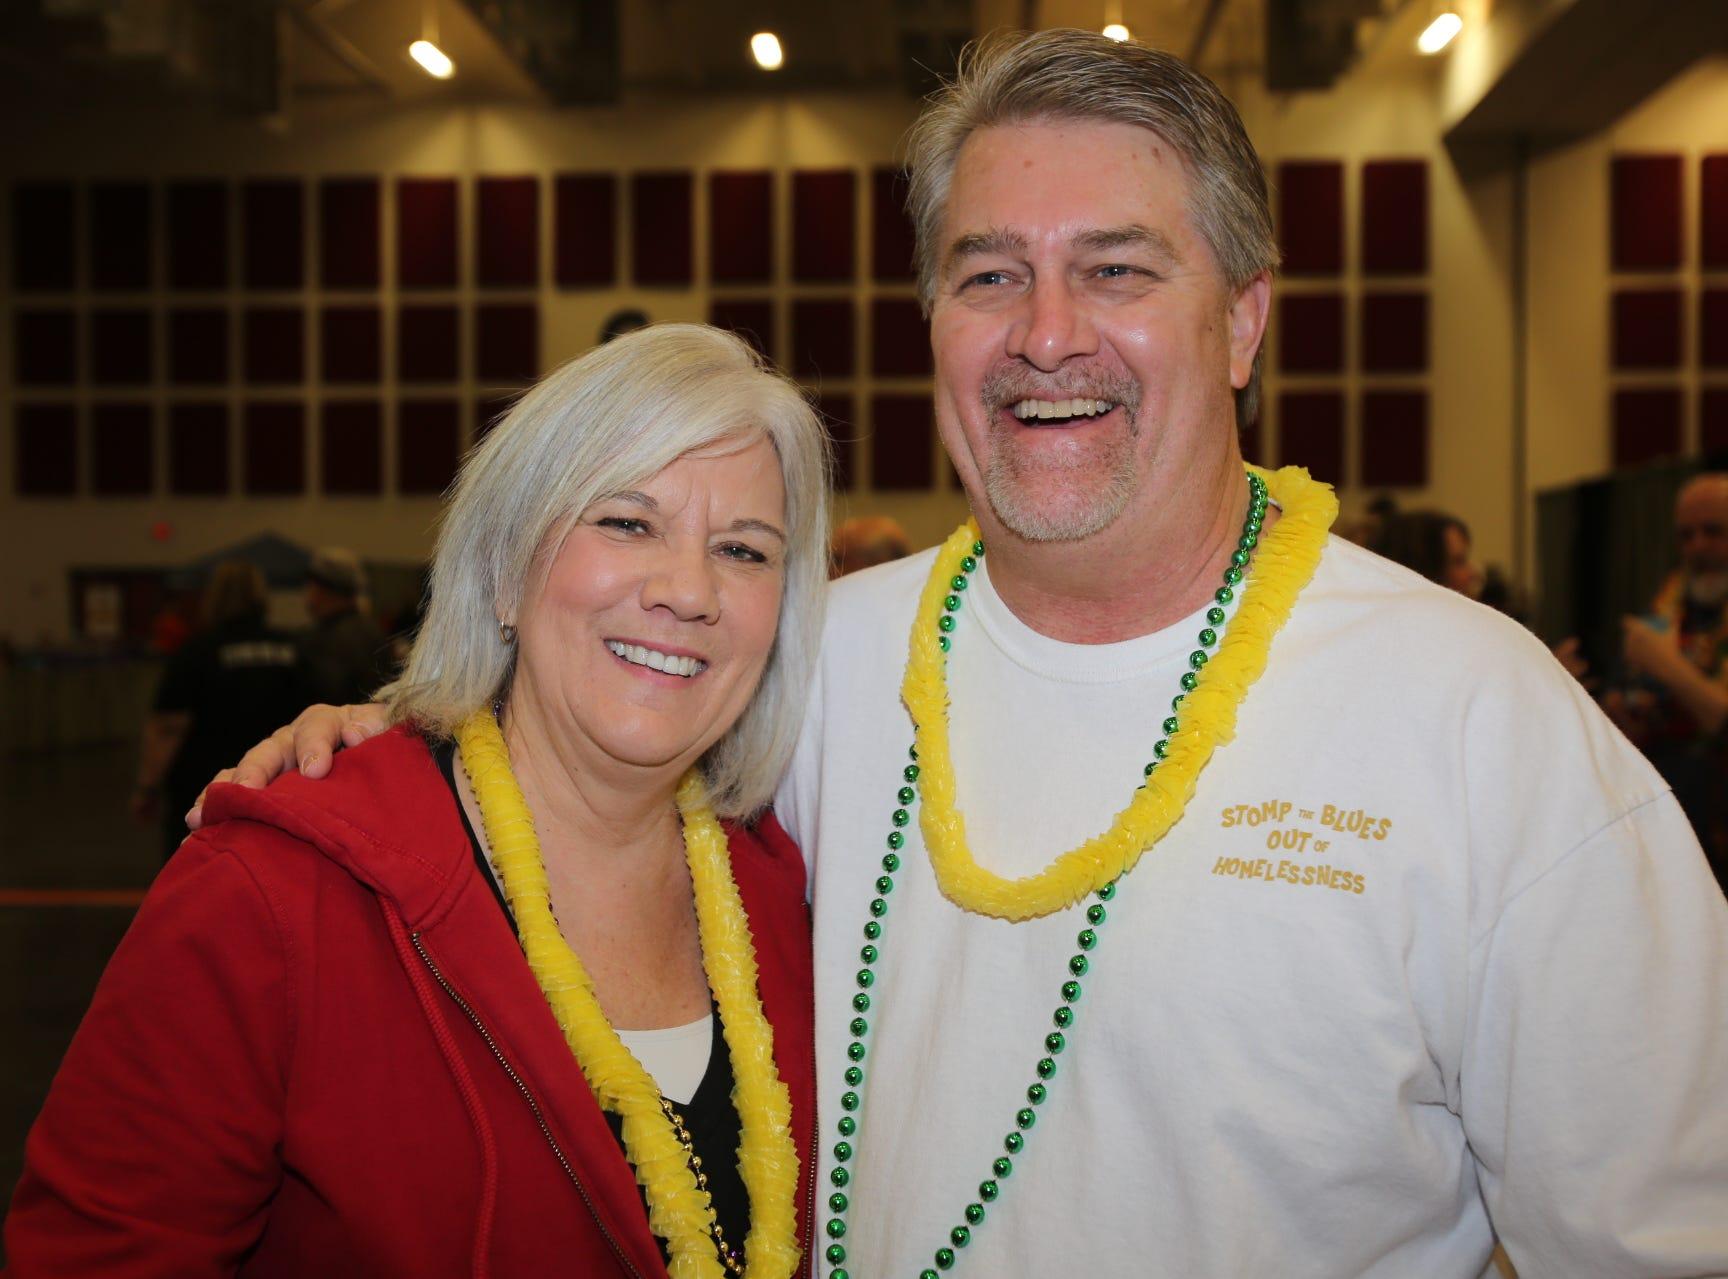 Paige and Jim Payne